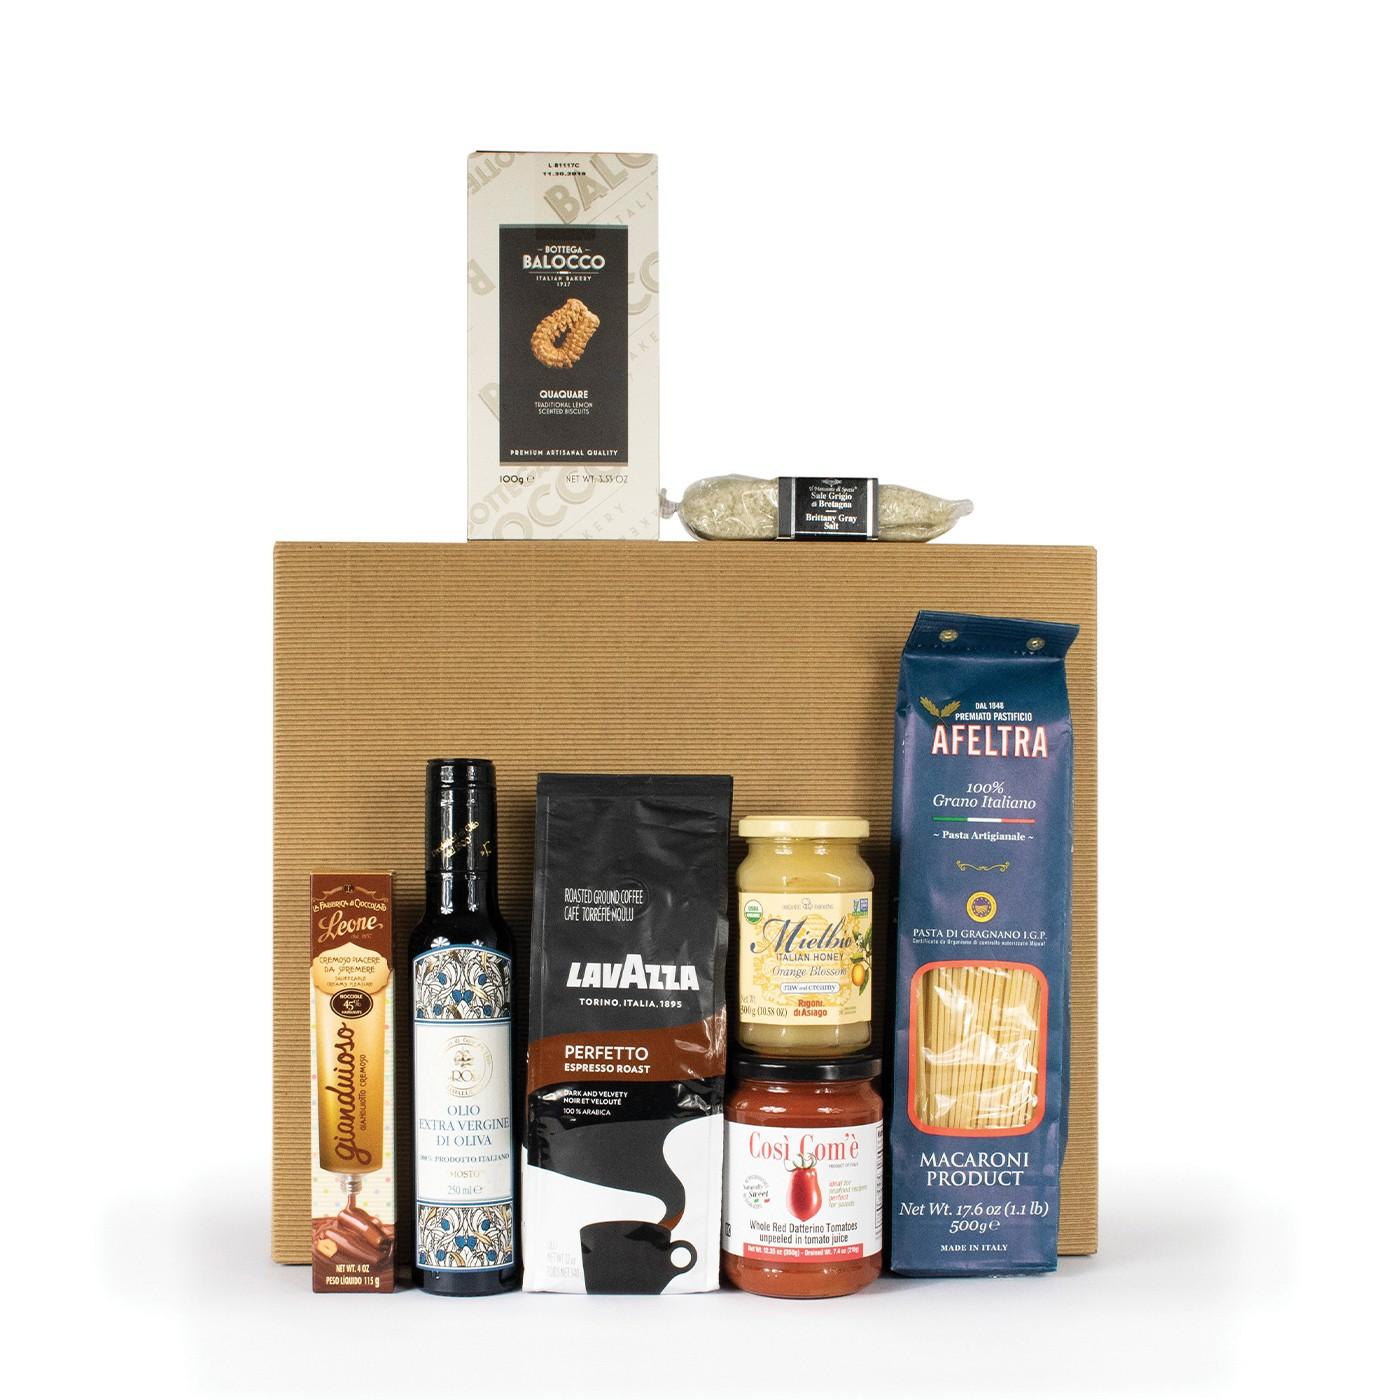 Italian food gift basket: iconic products